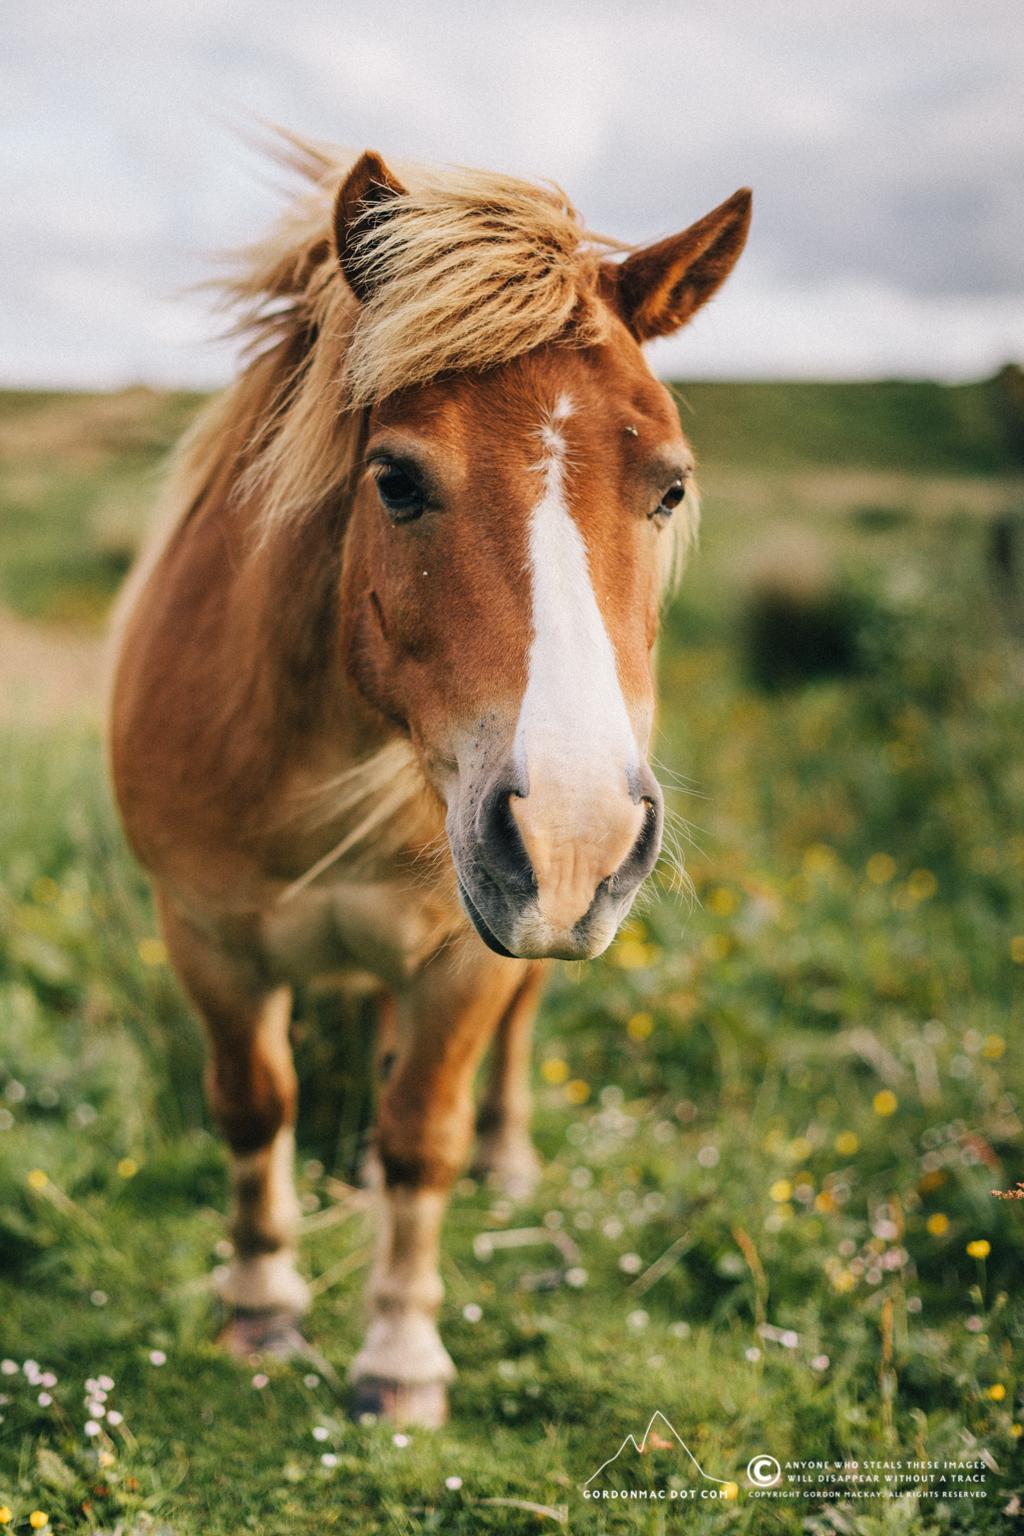 The horse's sidekick